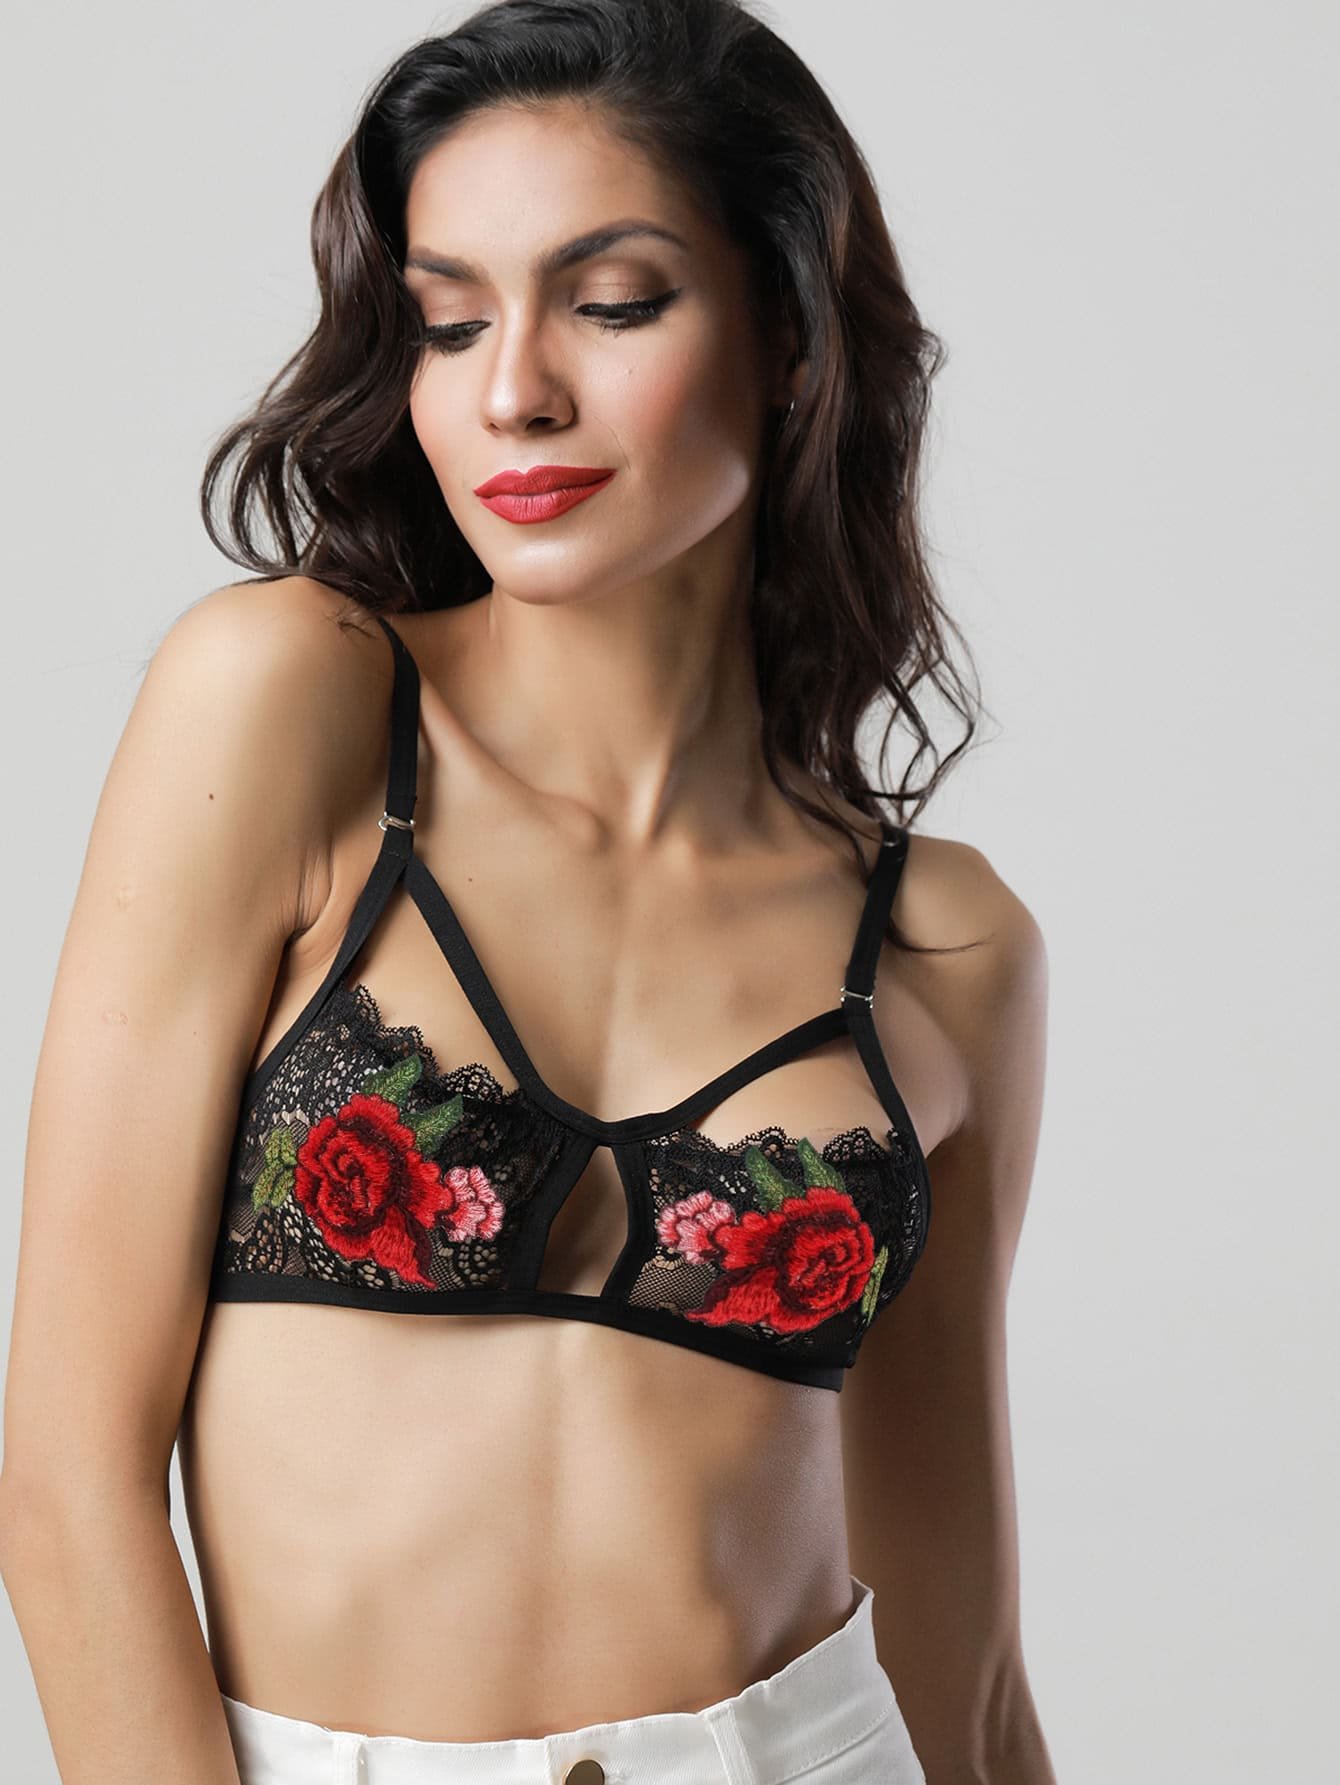 Flower Applique Harness Detail Bralette lingerie170703310